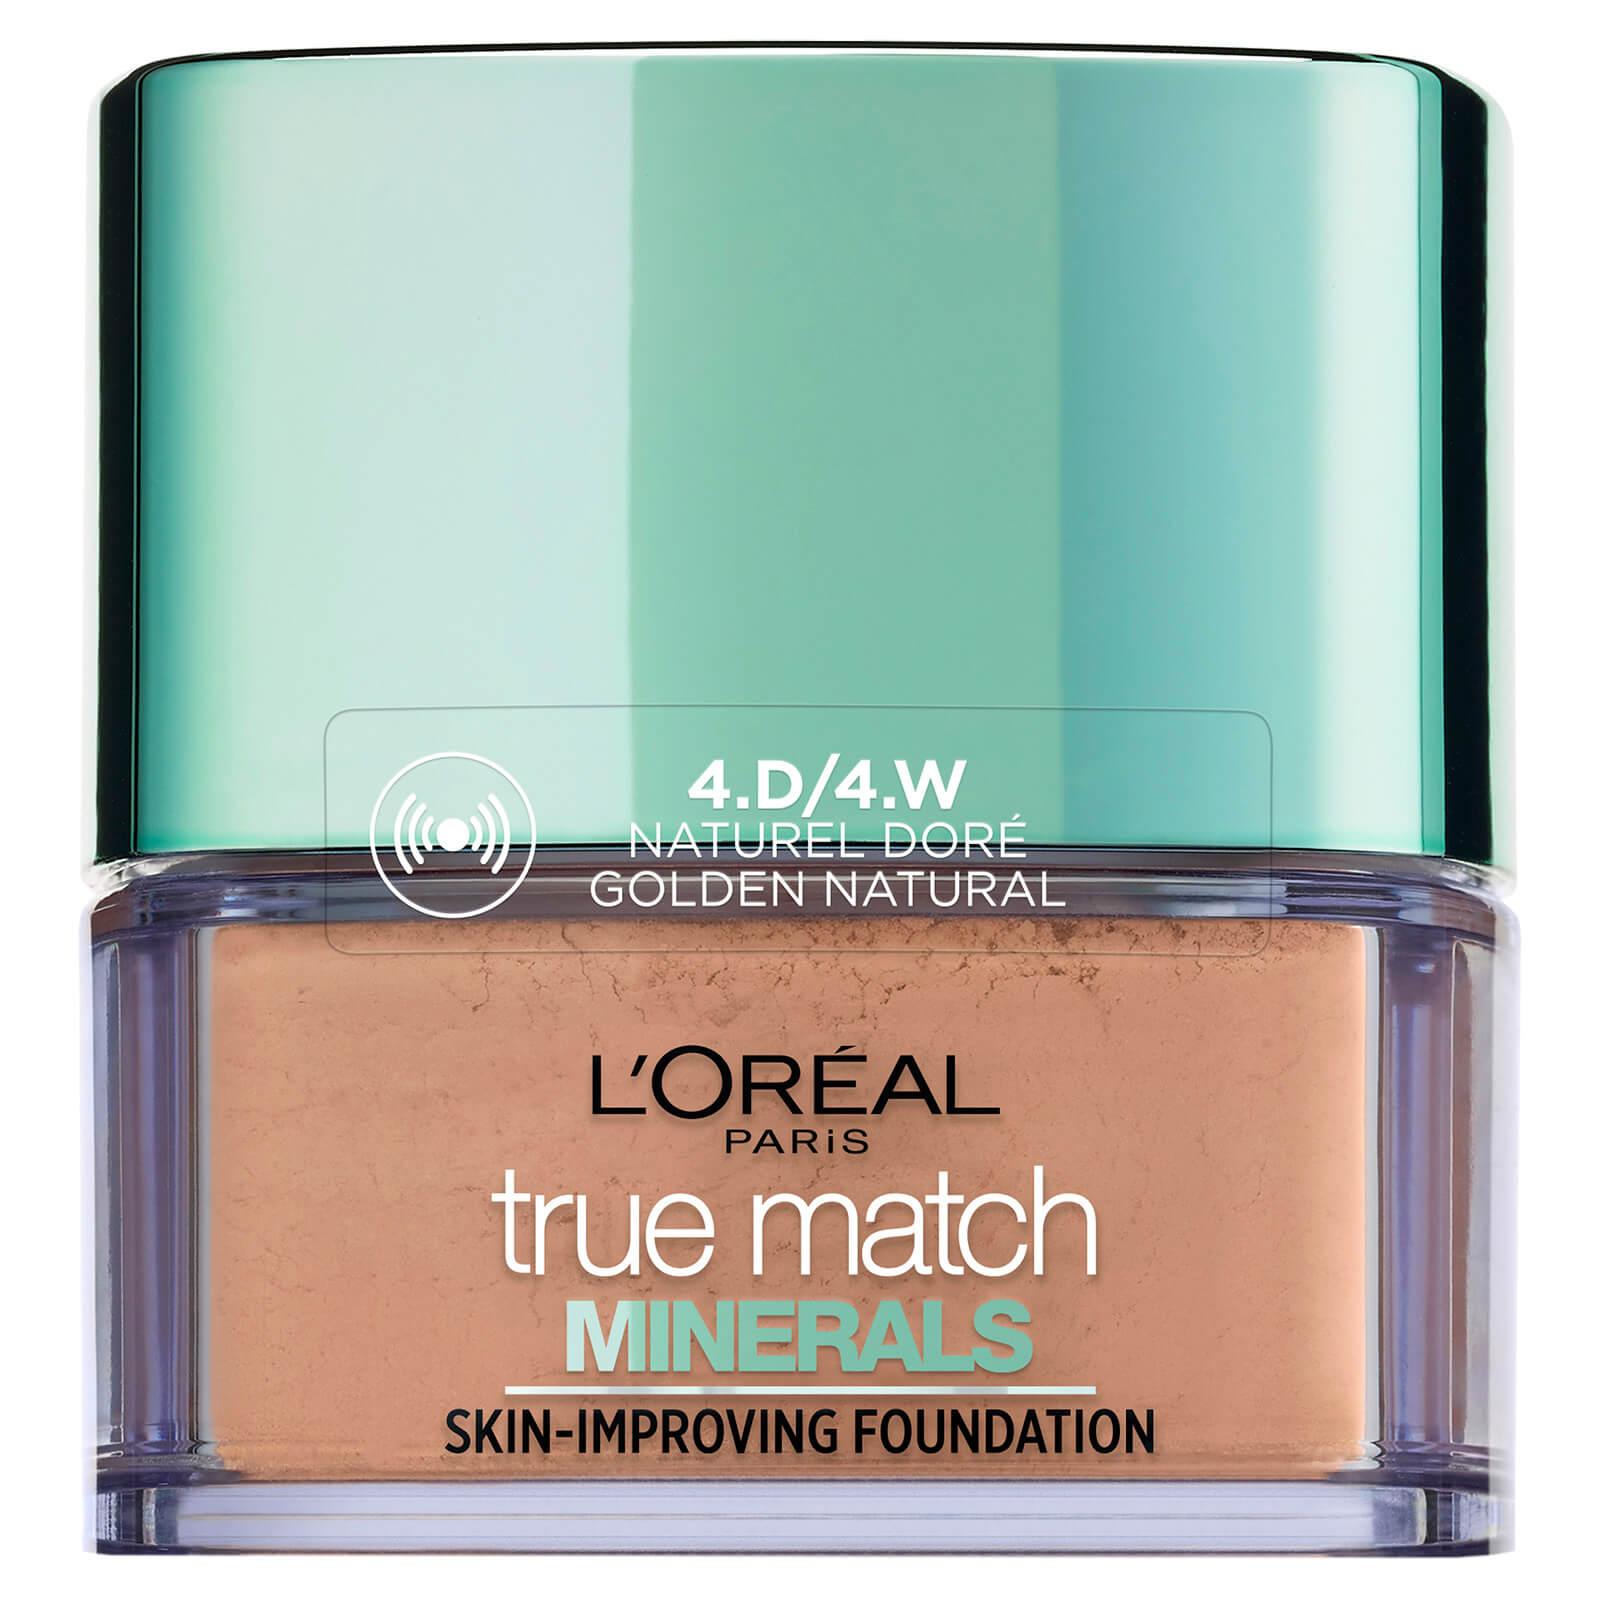 Купить L'Oréal Paris True Match Minerals Foundation 10g (Various Shades) - 4W Gold Natural